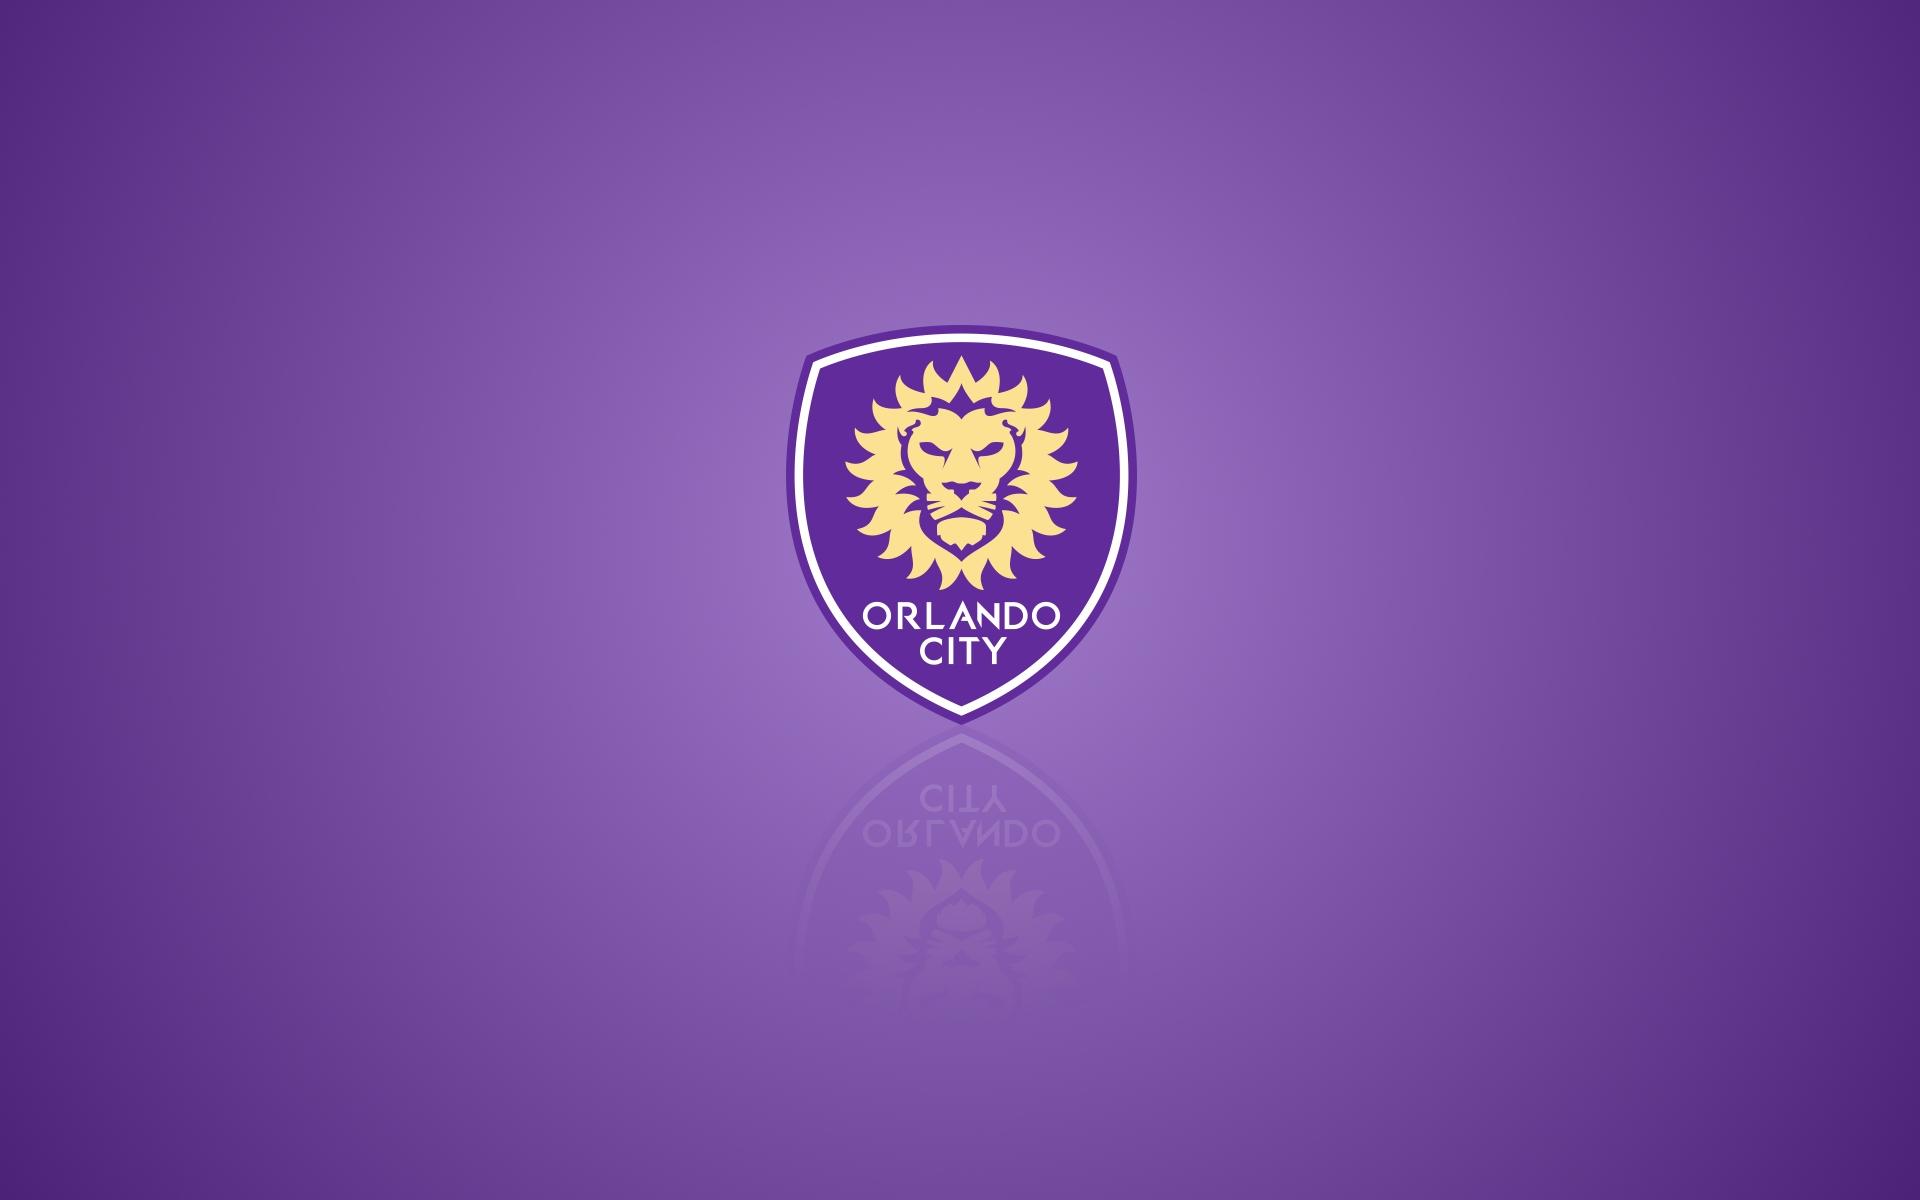 orlando city sc � logos download